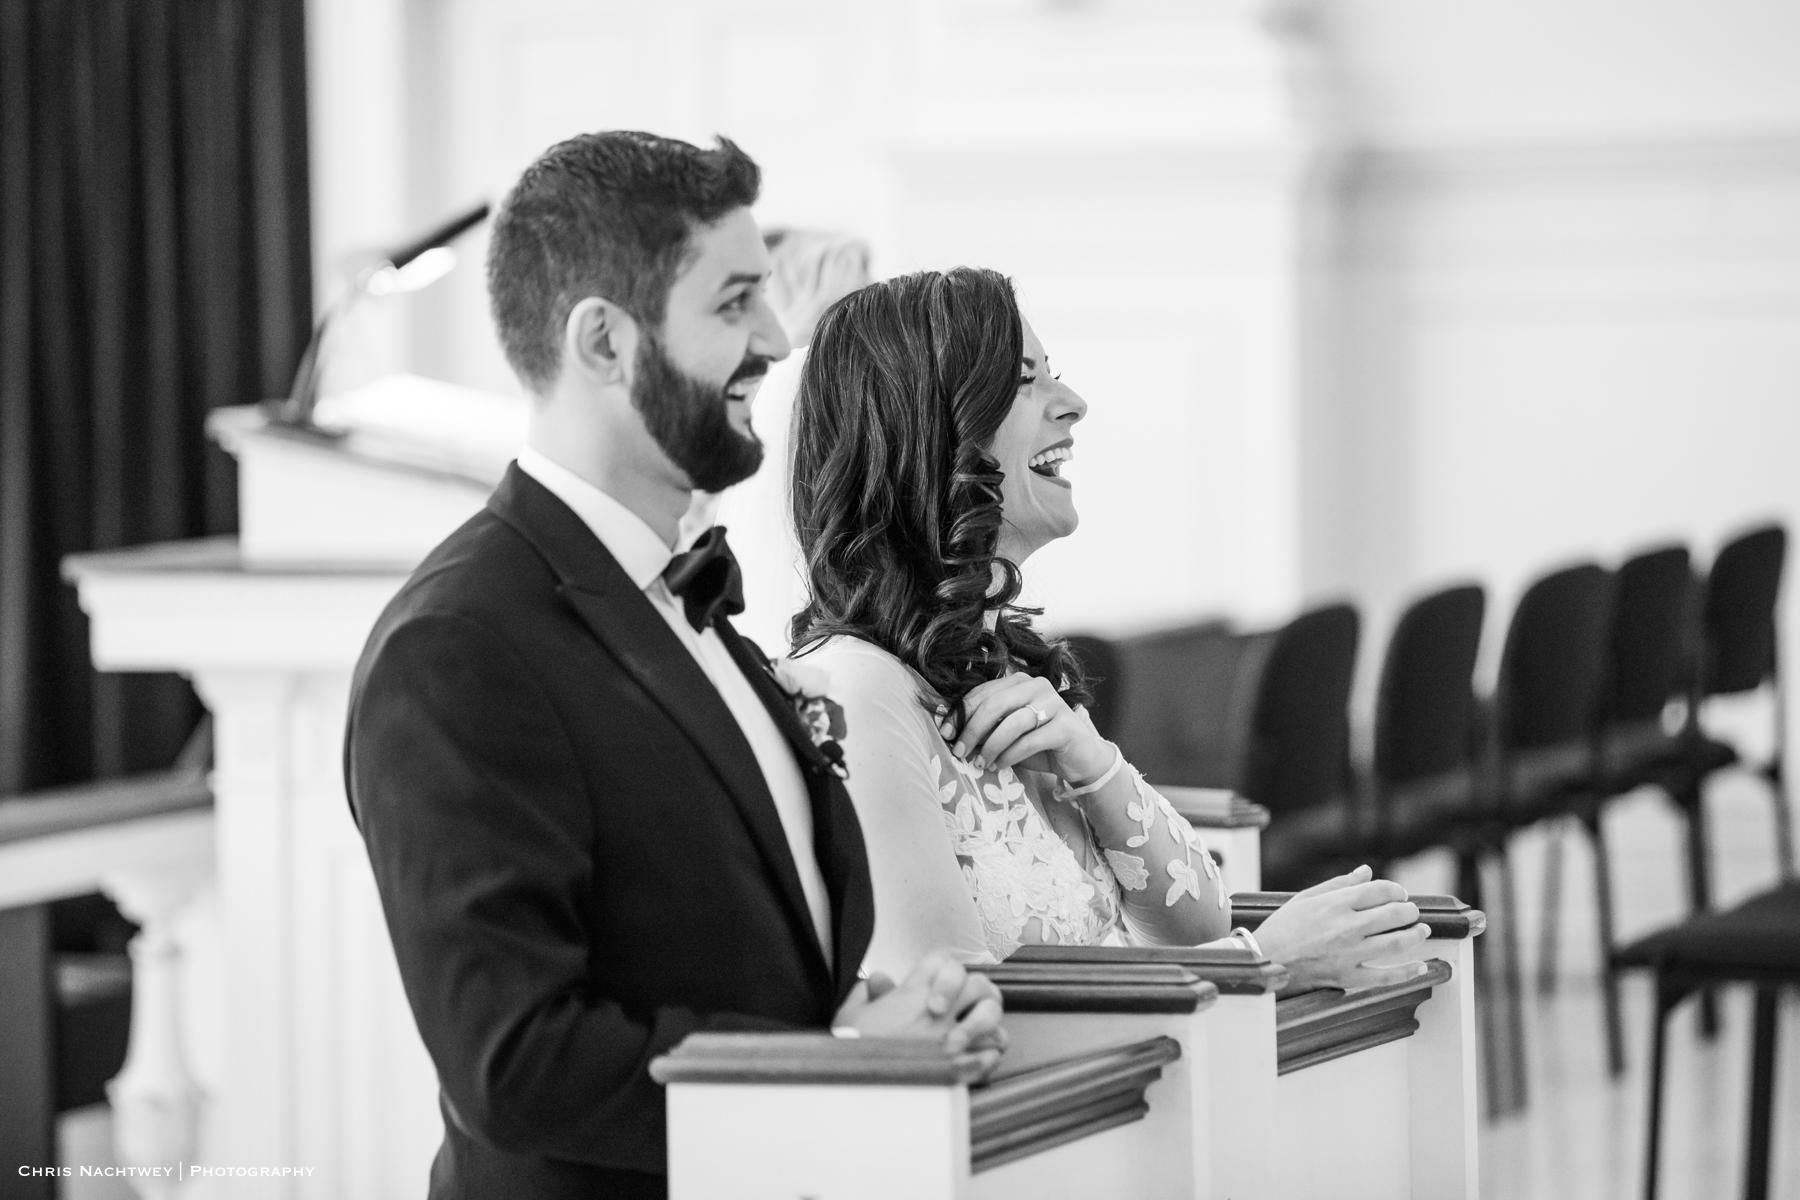 winter-branford-house-wedding-photos-groton-ct-chris-nachtwey-photography-2019-13.jpg